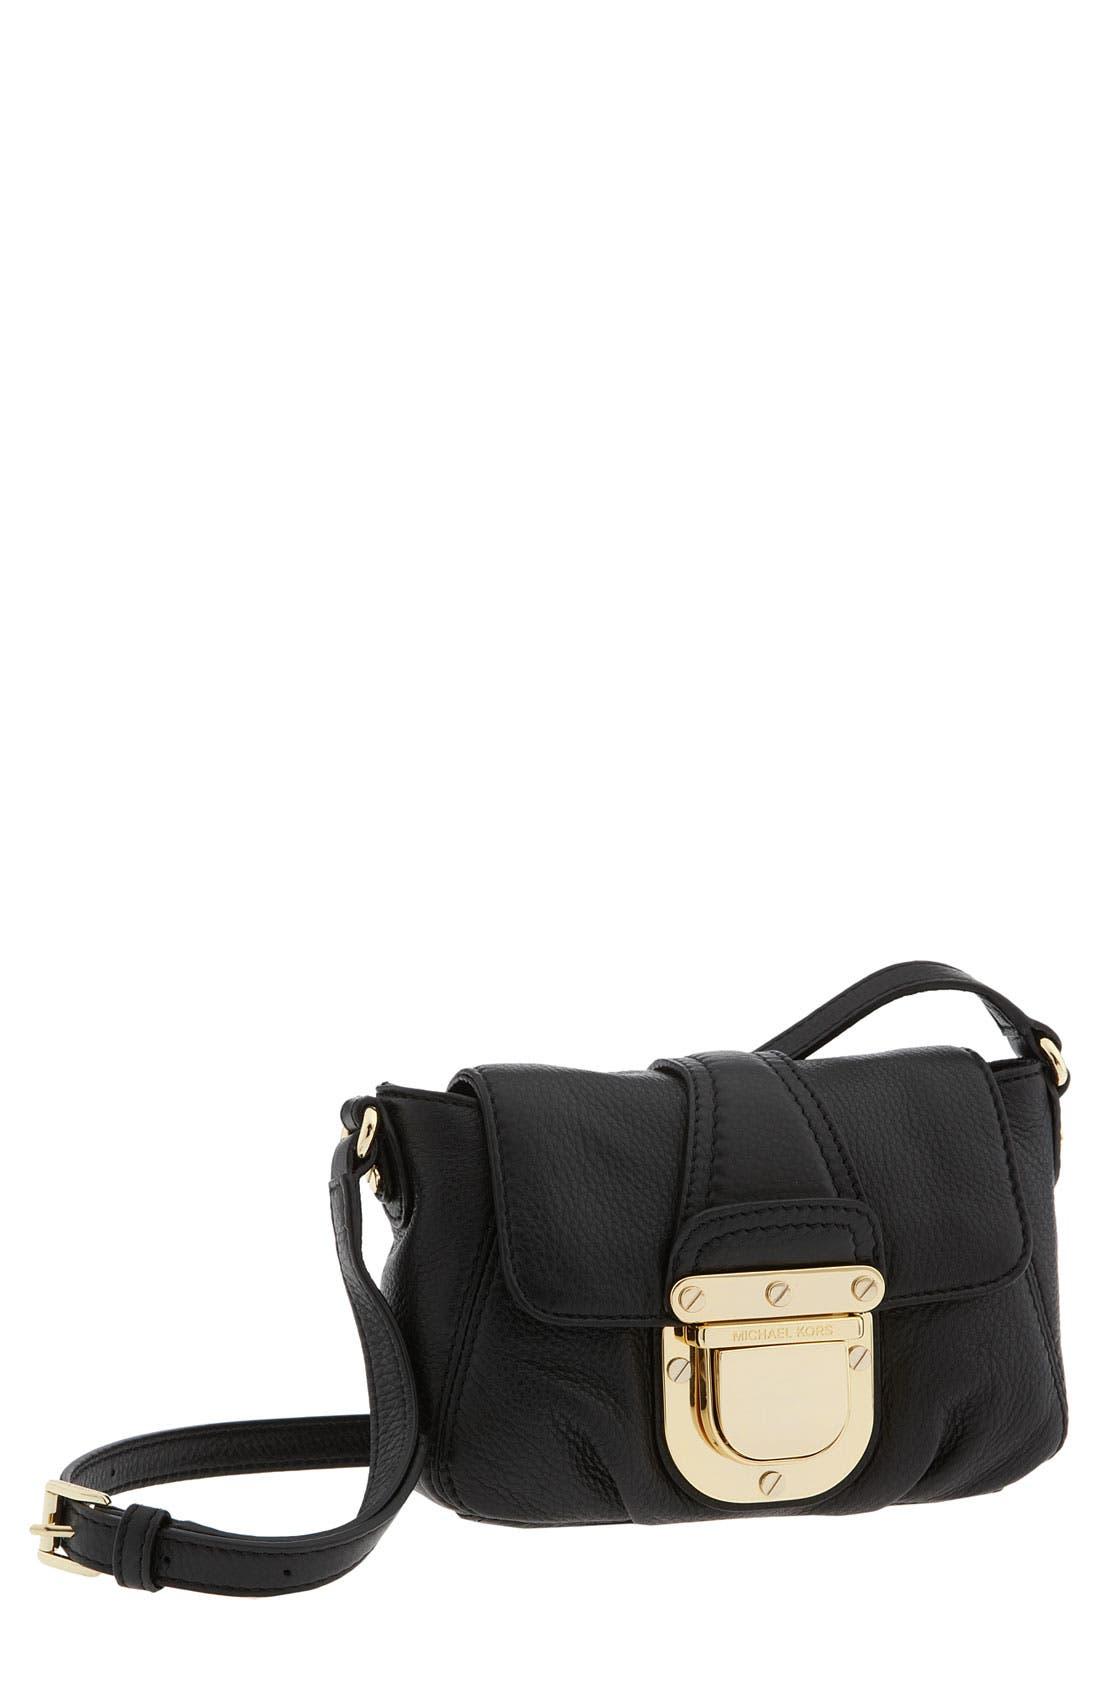 Alternate Image 1 Selected - MICHAEL Michael Kors 'Charlton' Crossbody Bag, Small